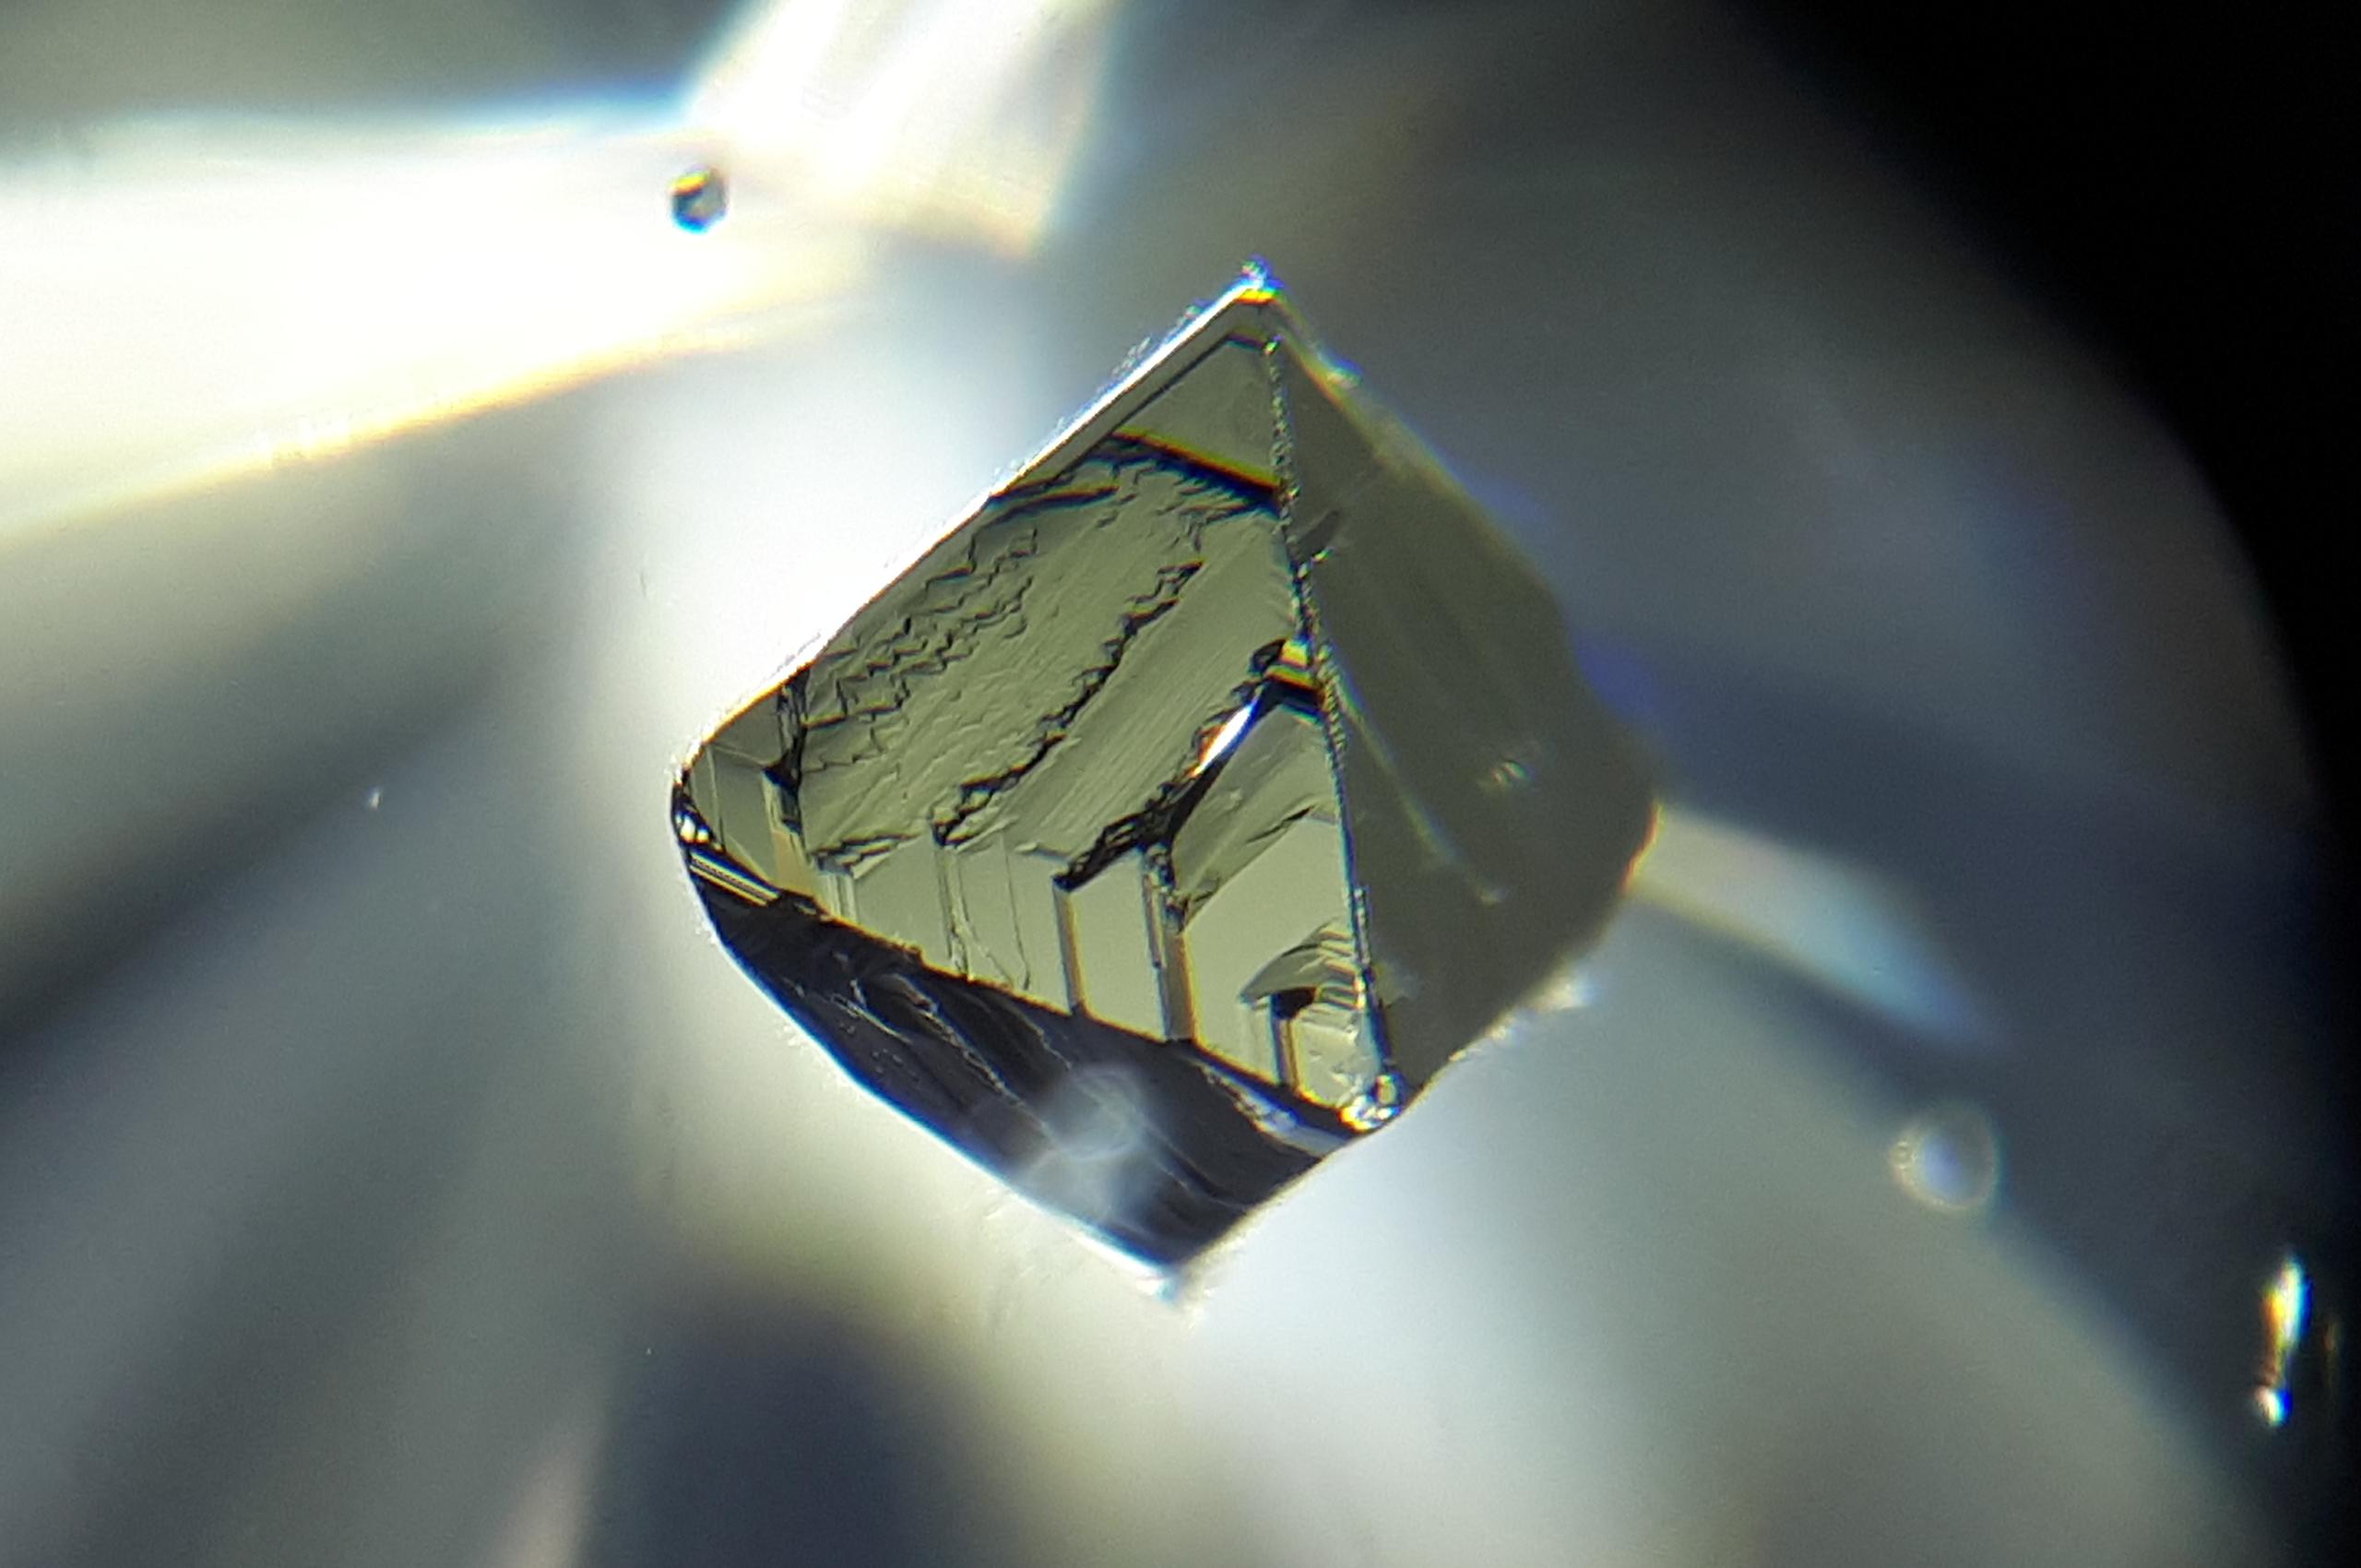 Pyrite inclusions in Quartz - Russia, Astafiewskoe deposit, South Ural (2) - Igor Bolotovski